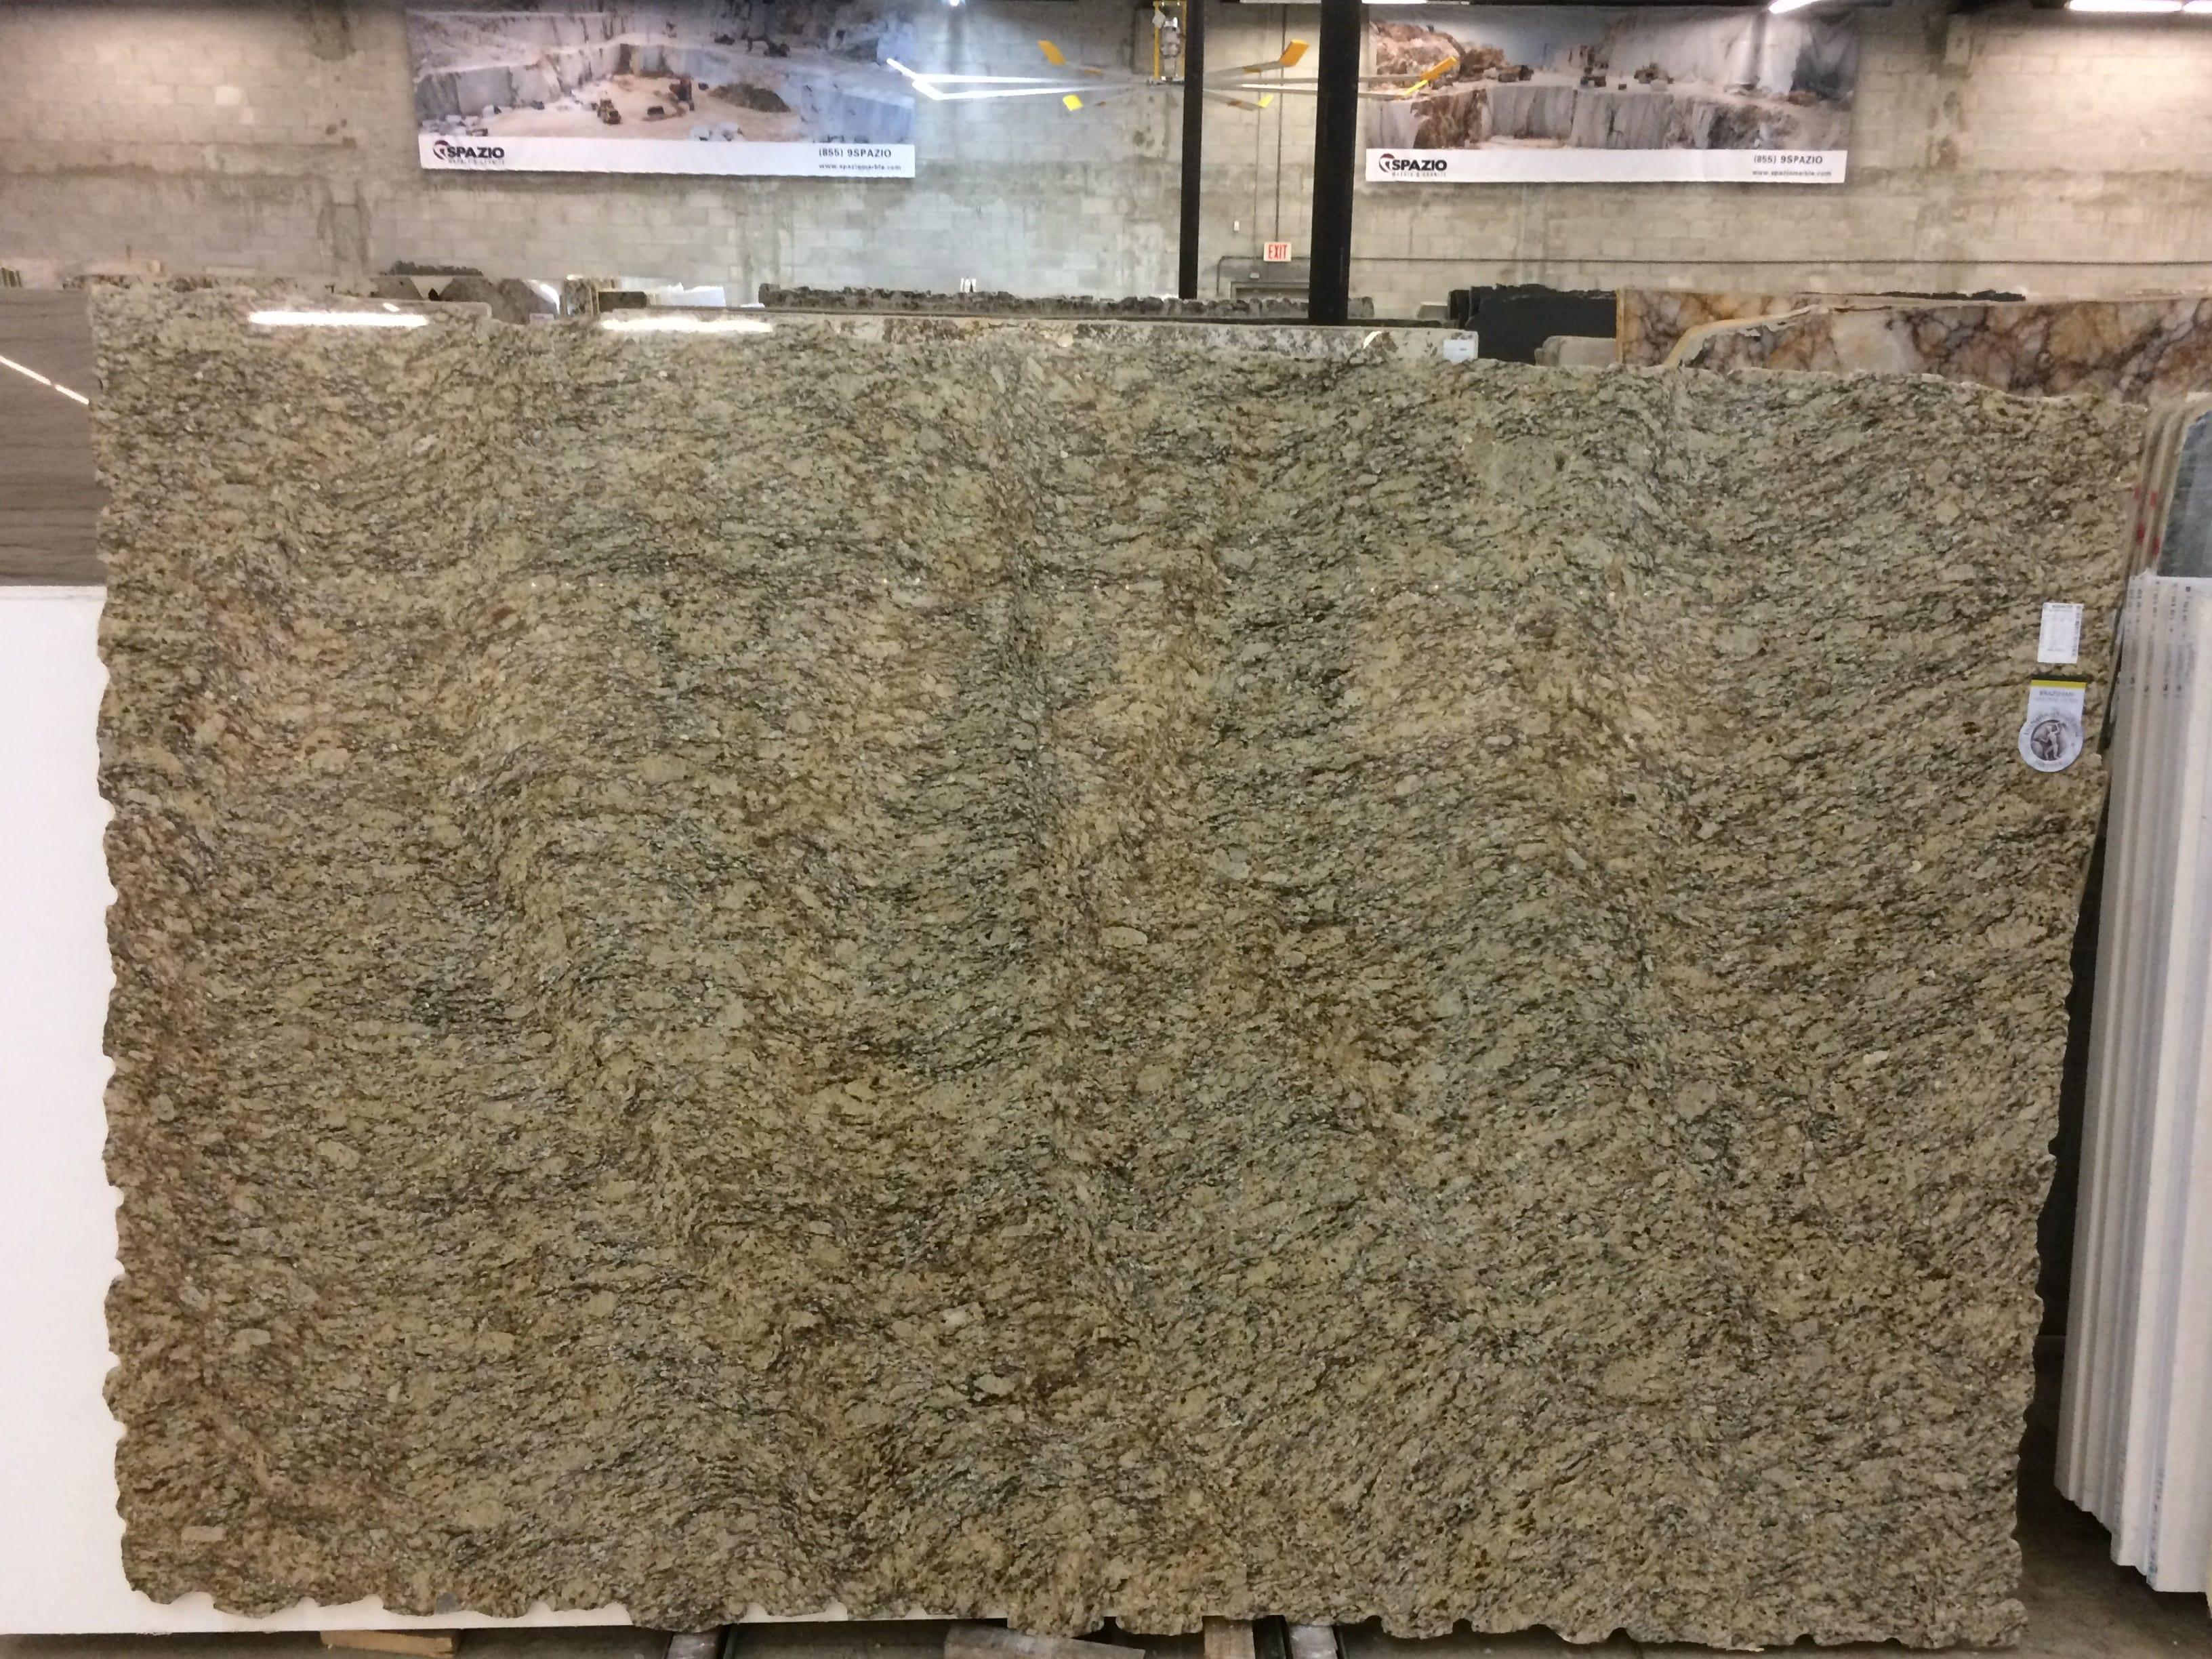 New Venetian Gold 35190 3cm Spazio Marble Granite